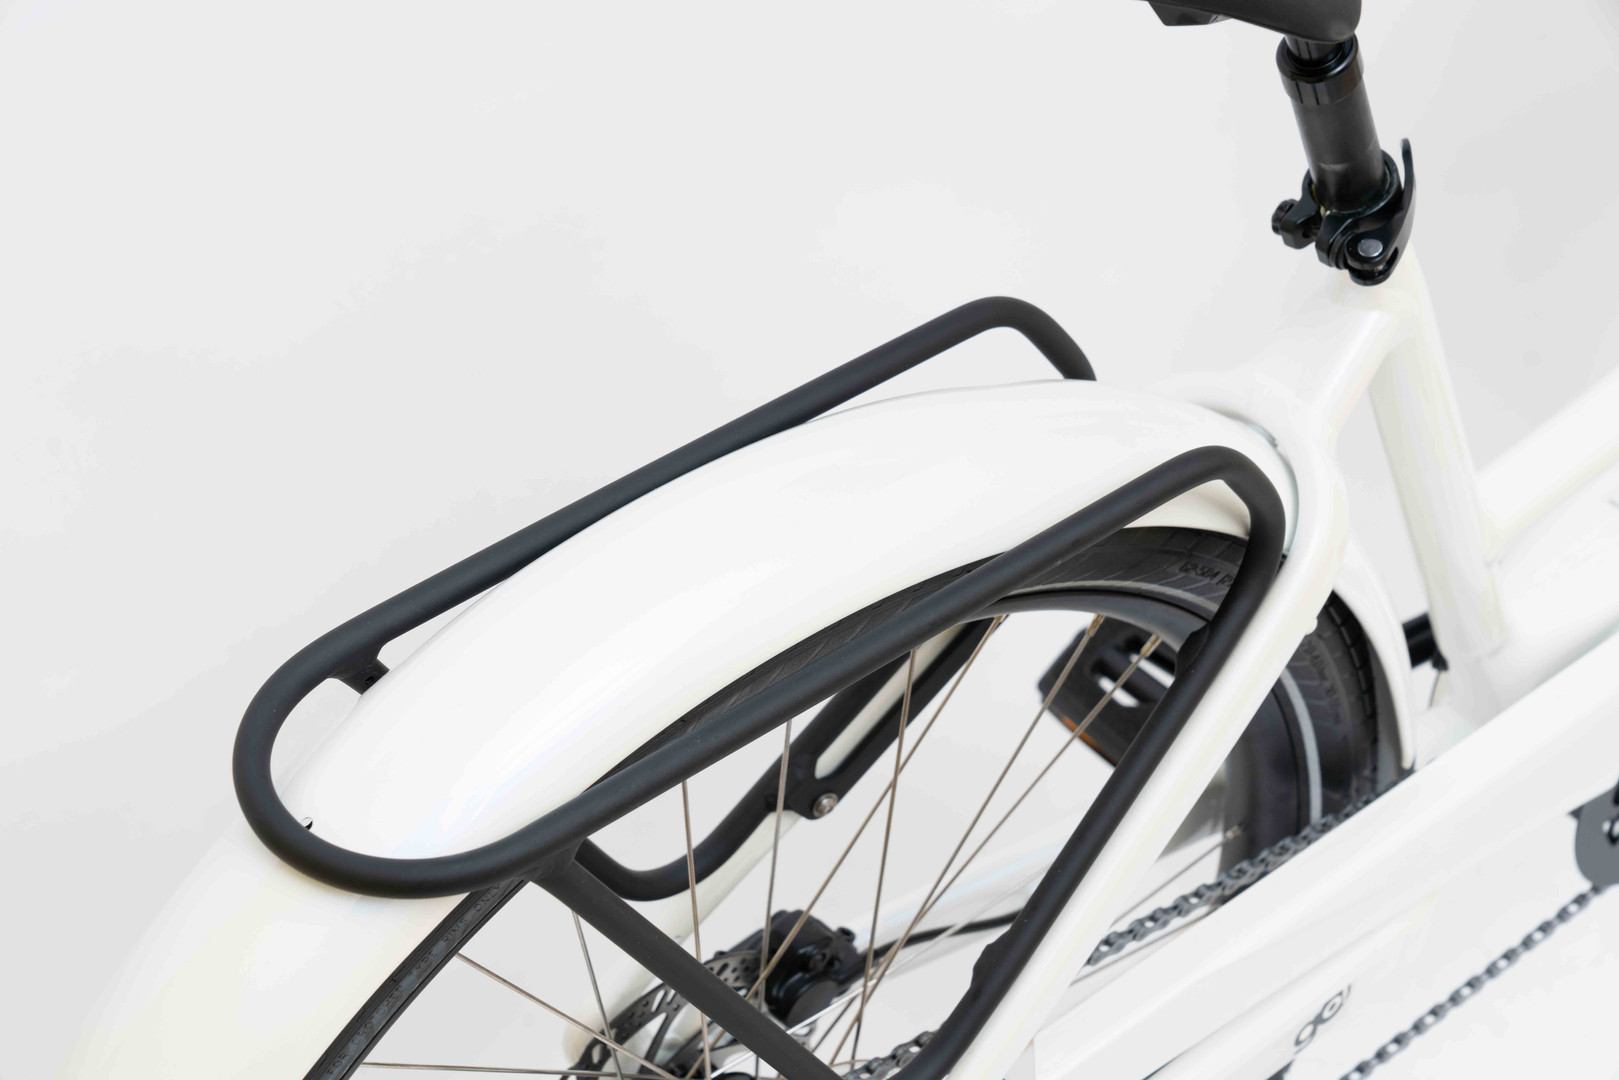 Fahrradladen_Pforzheim_Simoes_Bikes_036.